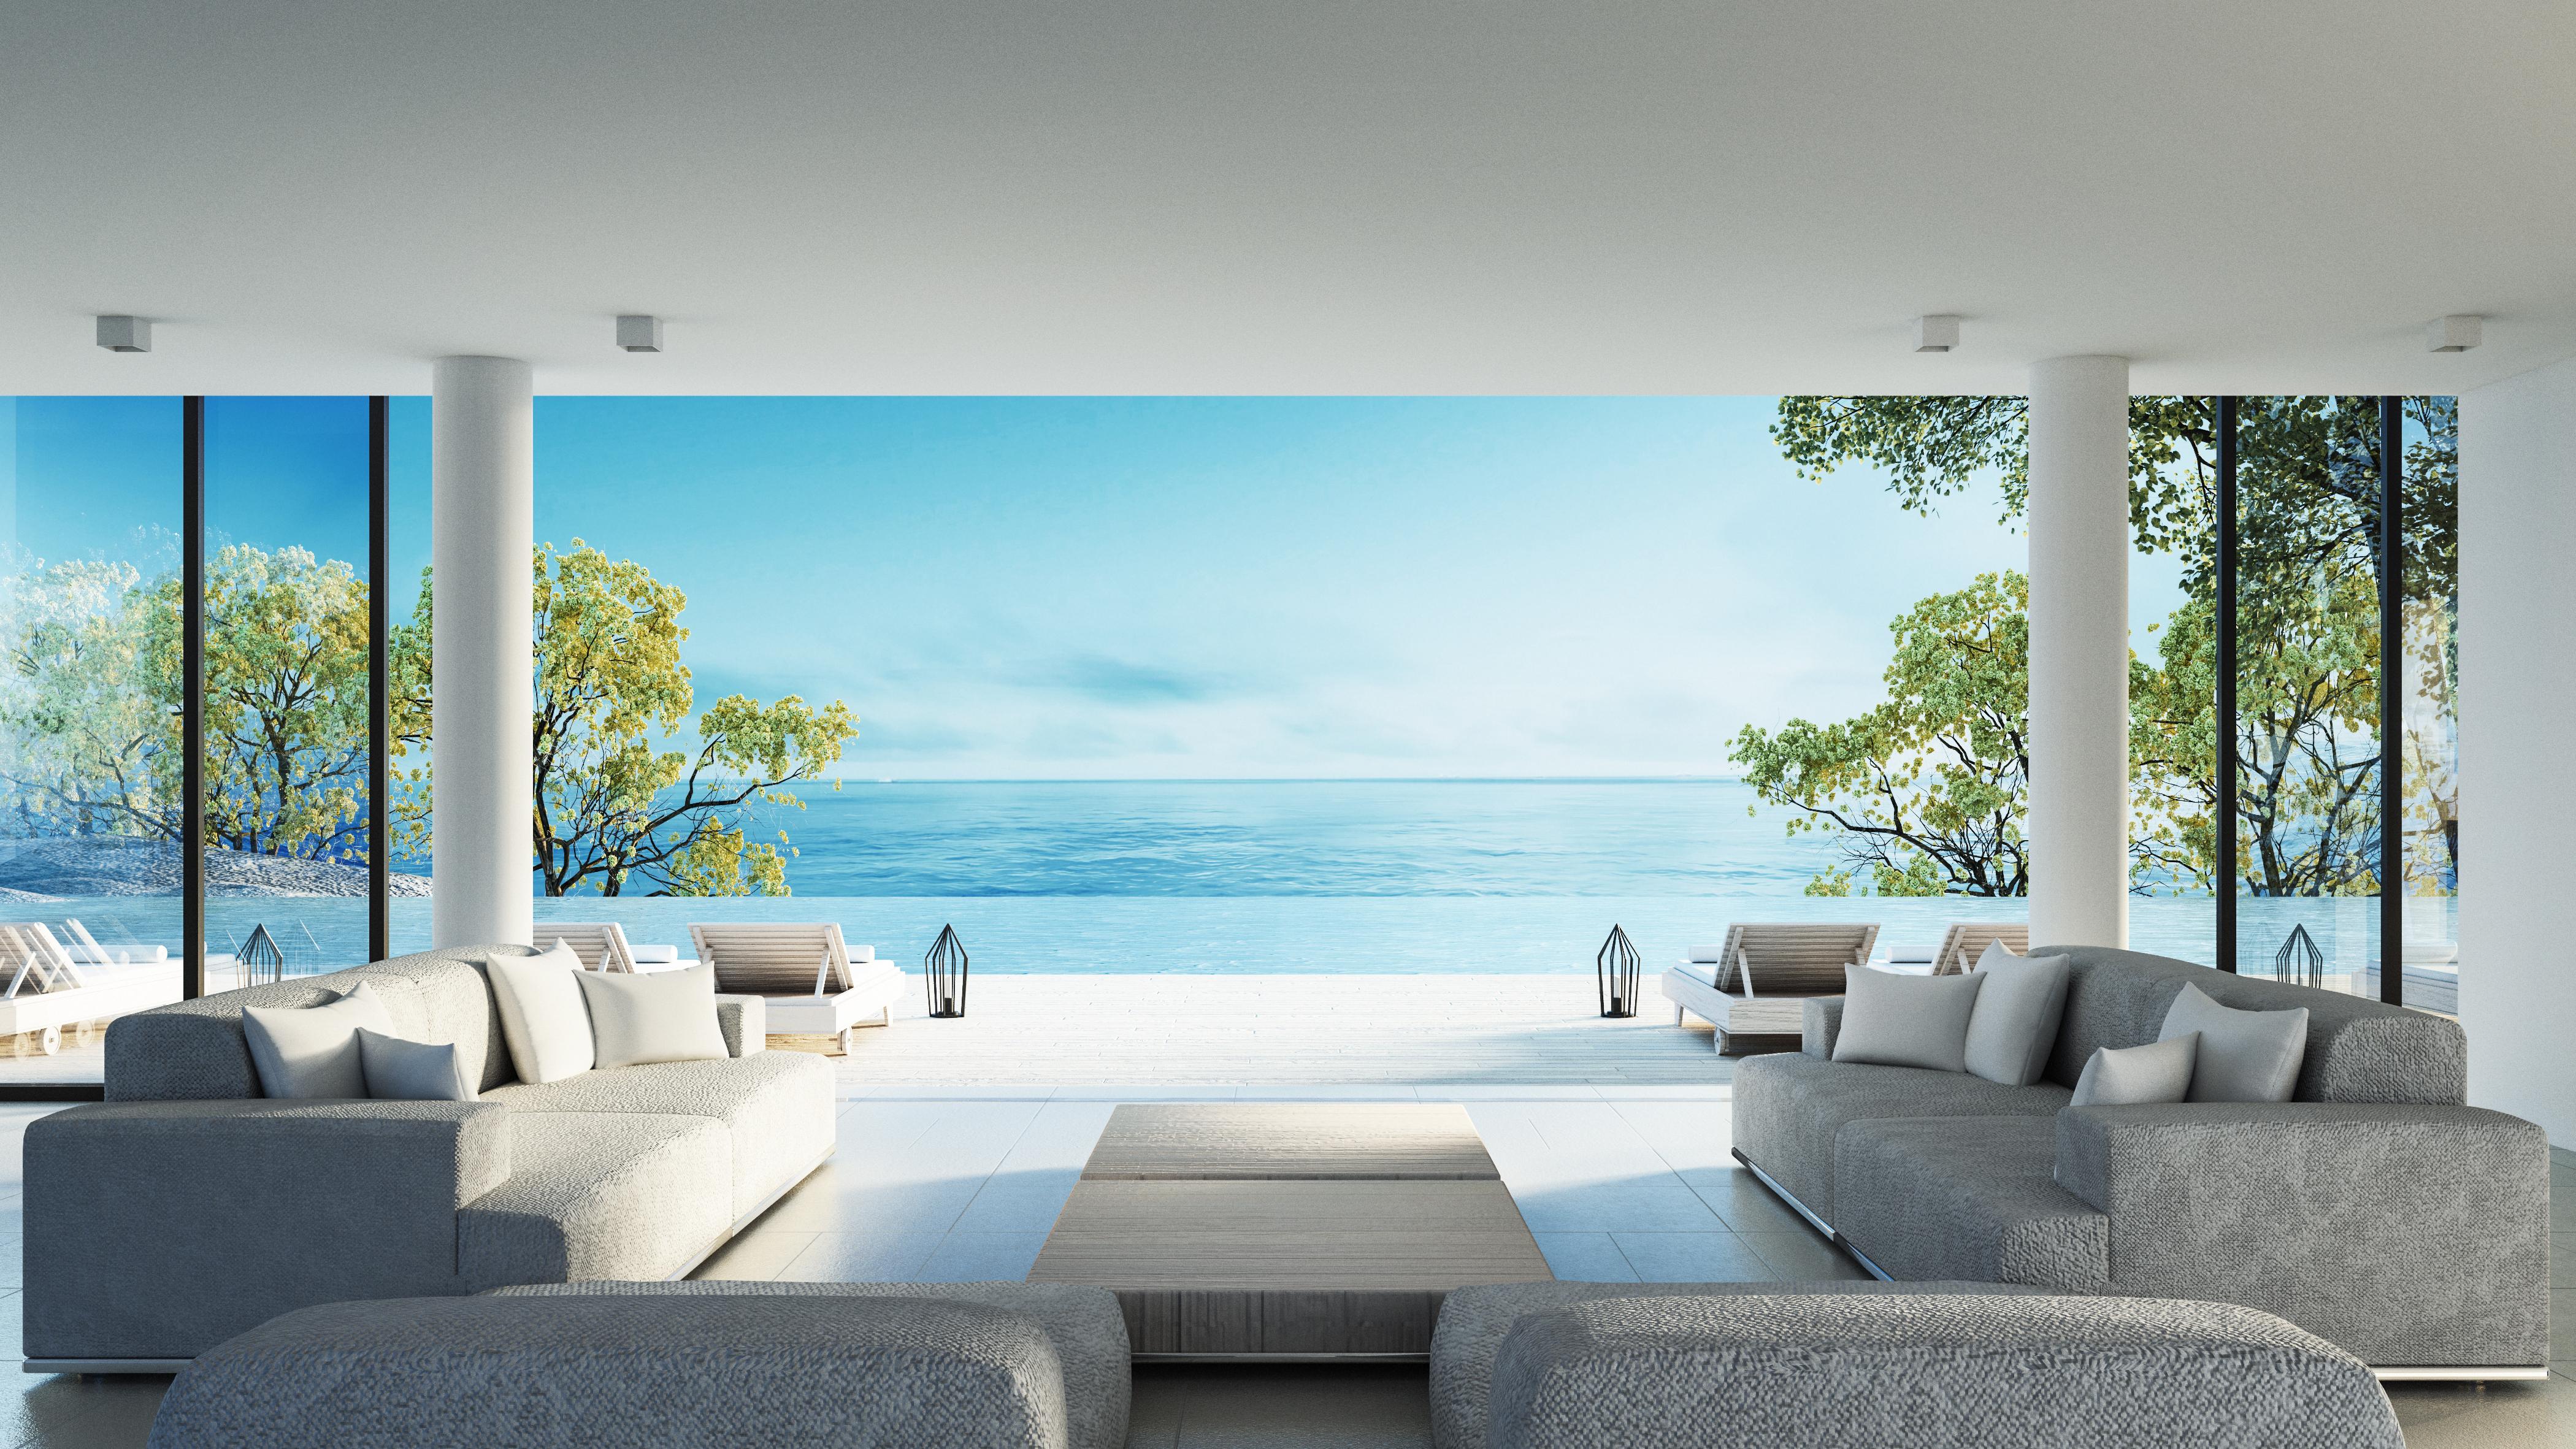 About Mallorca Property & Estate Management